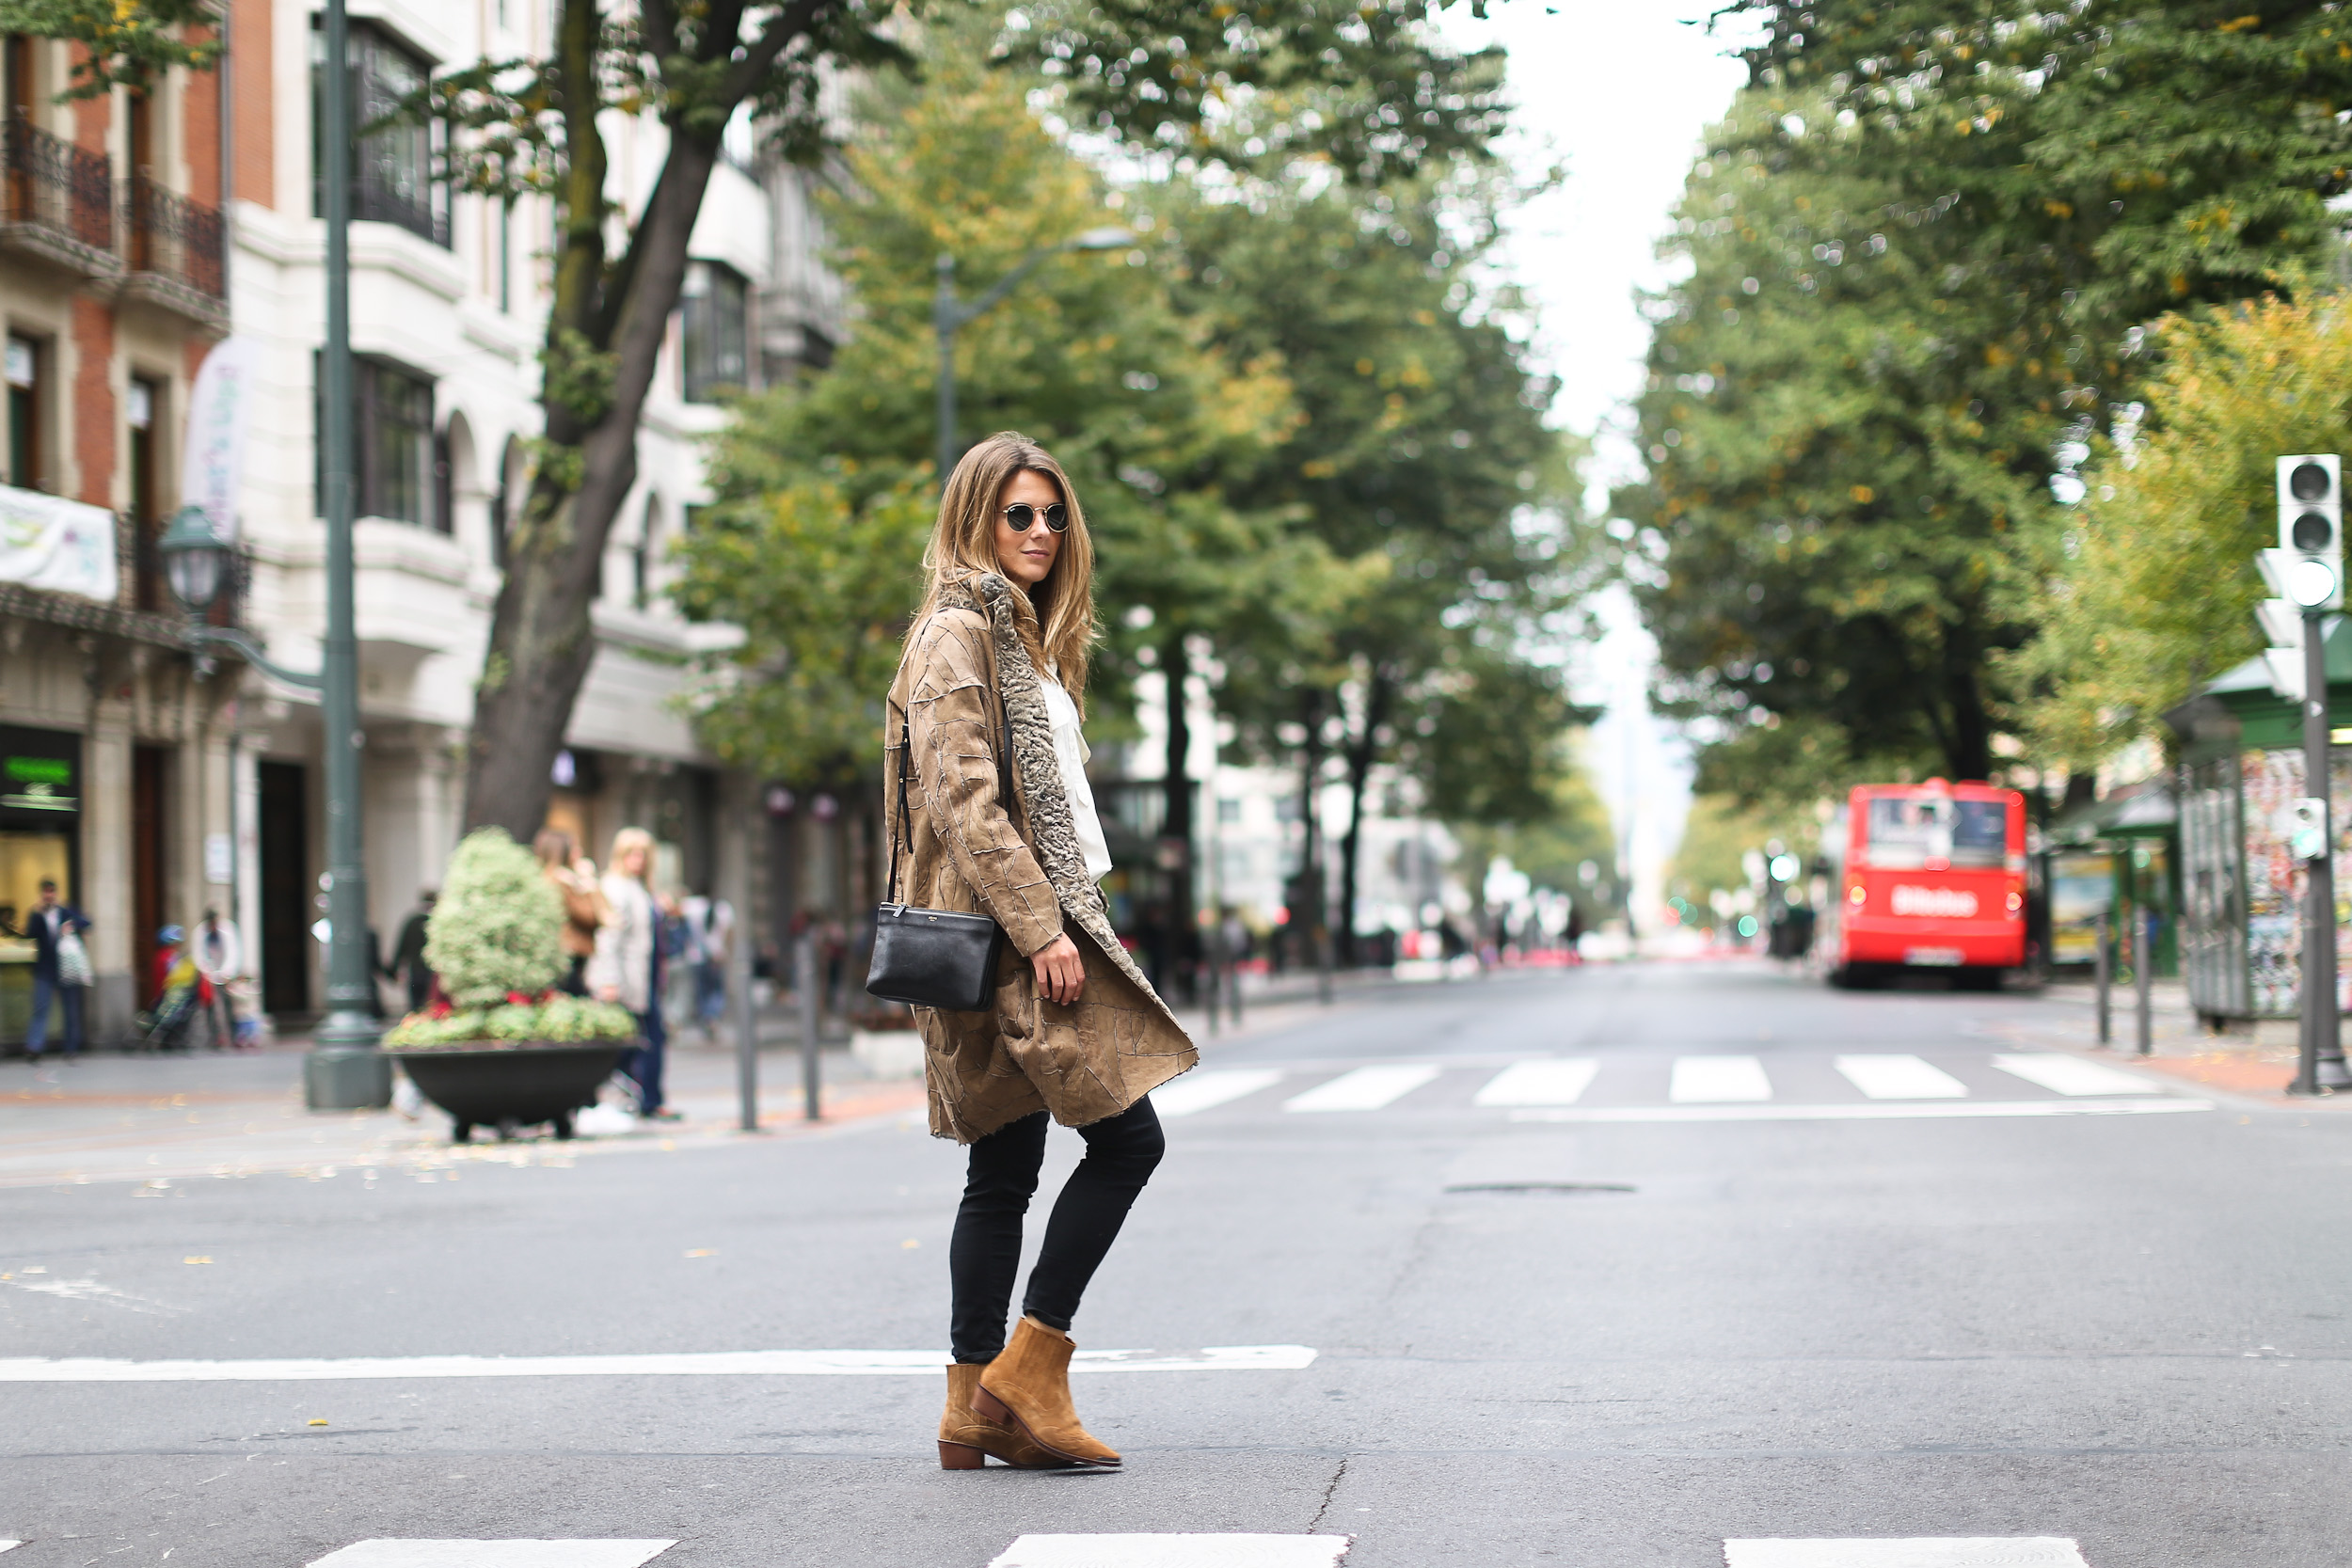 Clochet_streetstyle_boxcalf_chaqueta_ante_pelo_astracan_kalam_bilbao-3